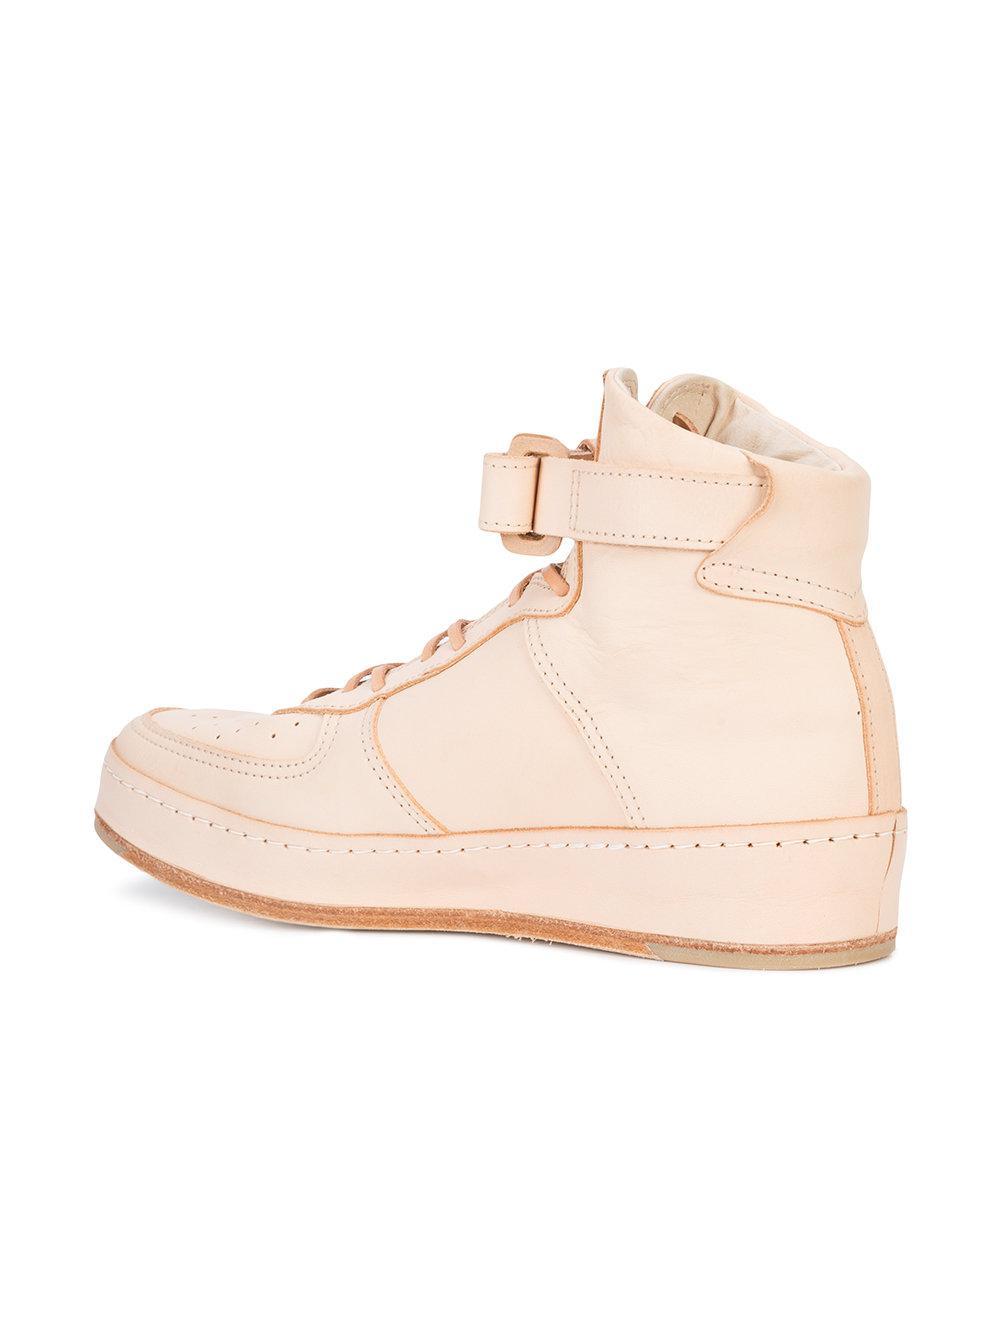 MIP 01 hi-top sneakers - Nude & Neutrals HENDER SCHEME kCoVvKV